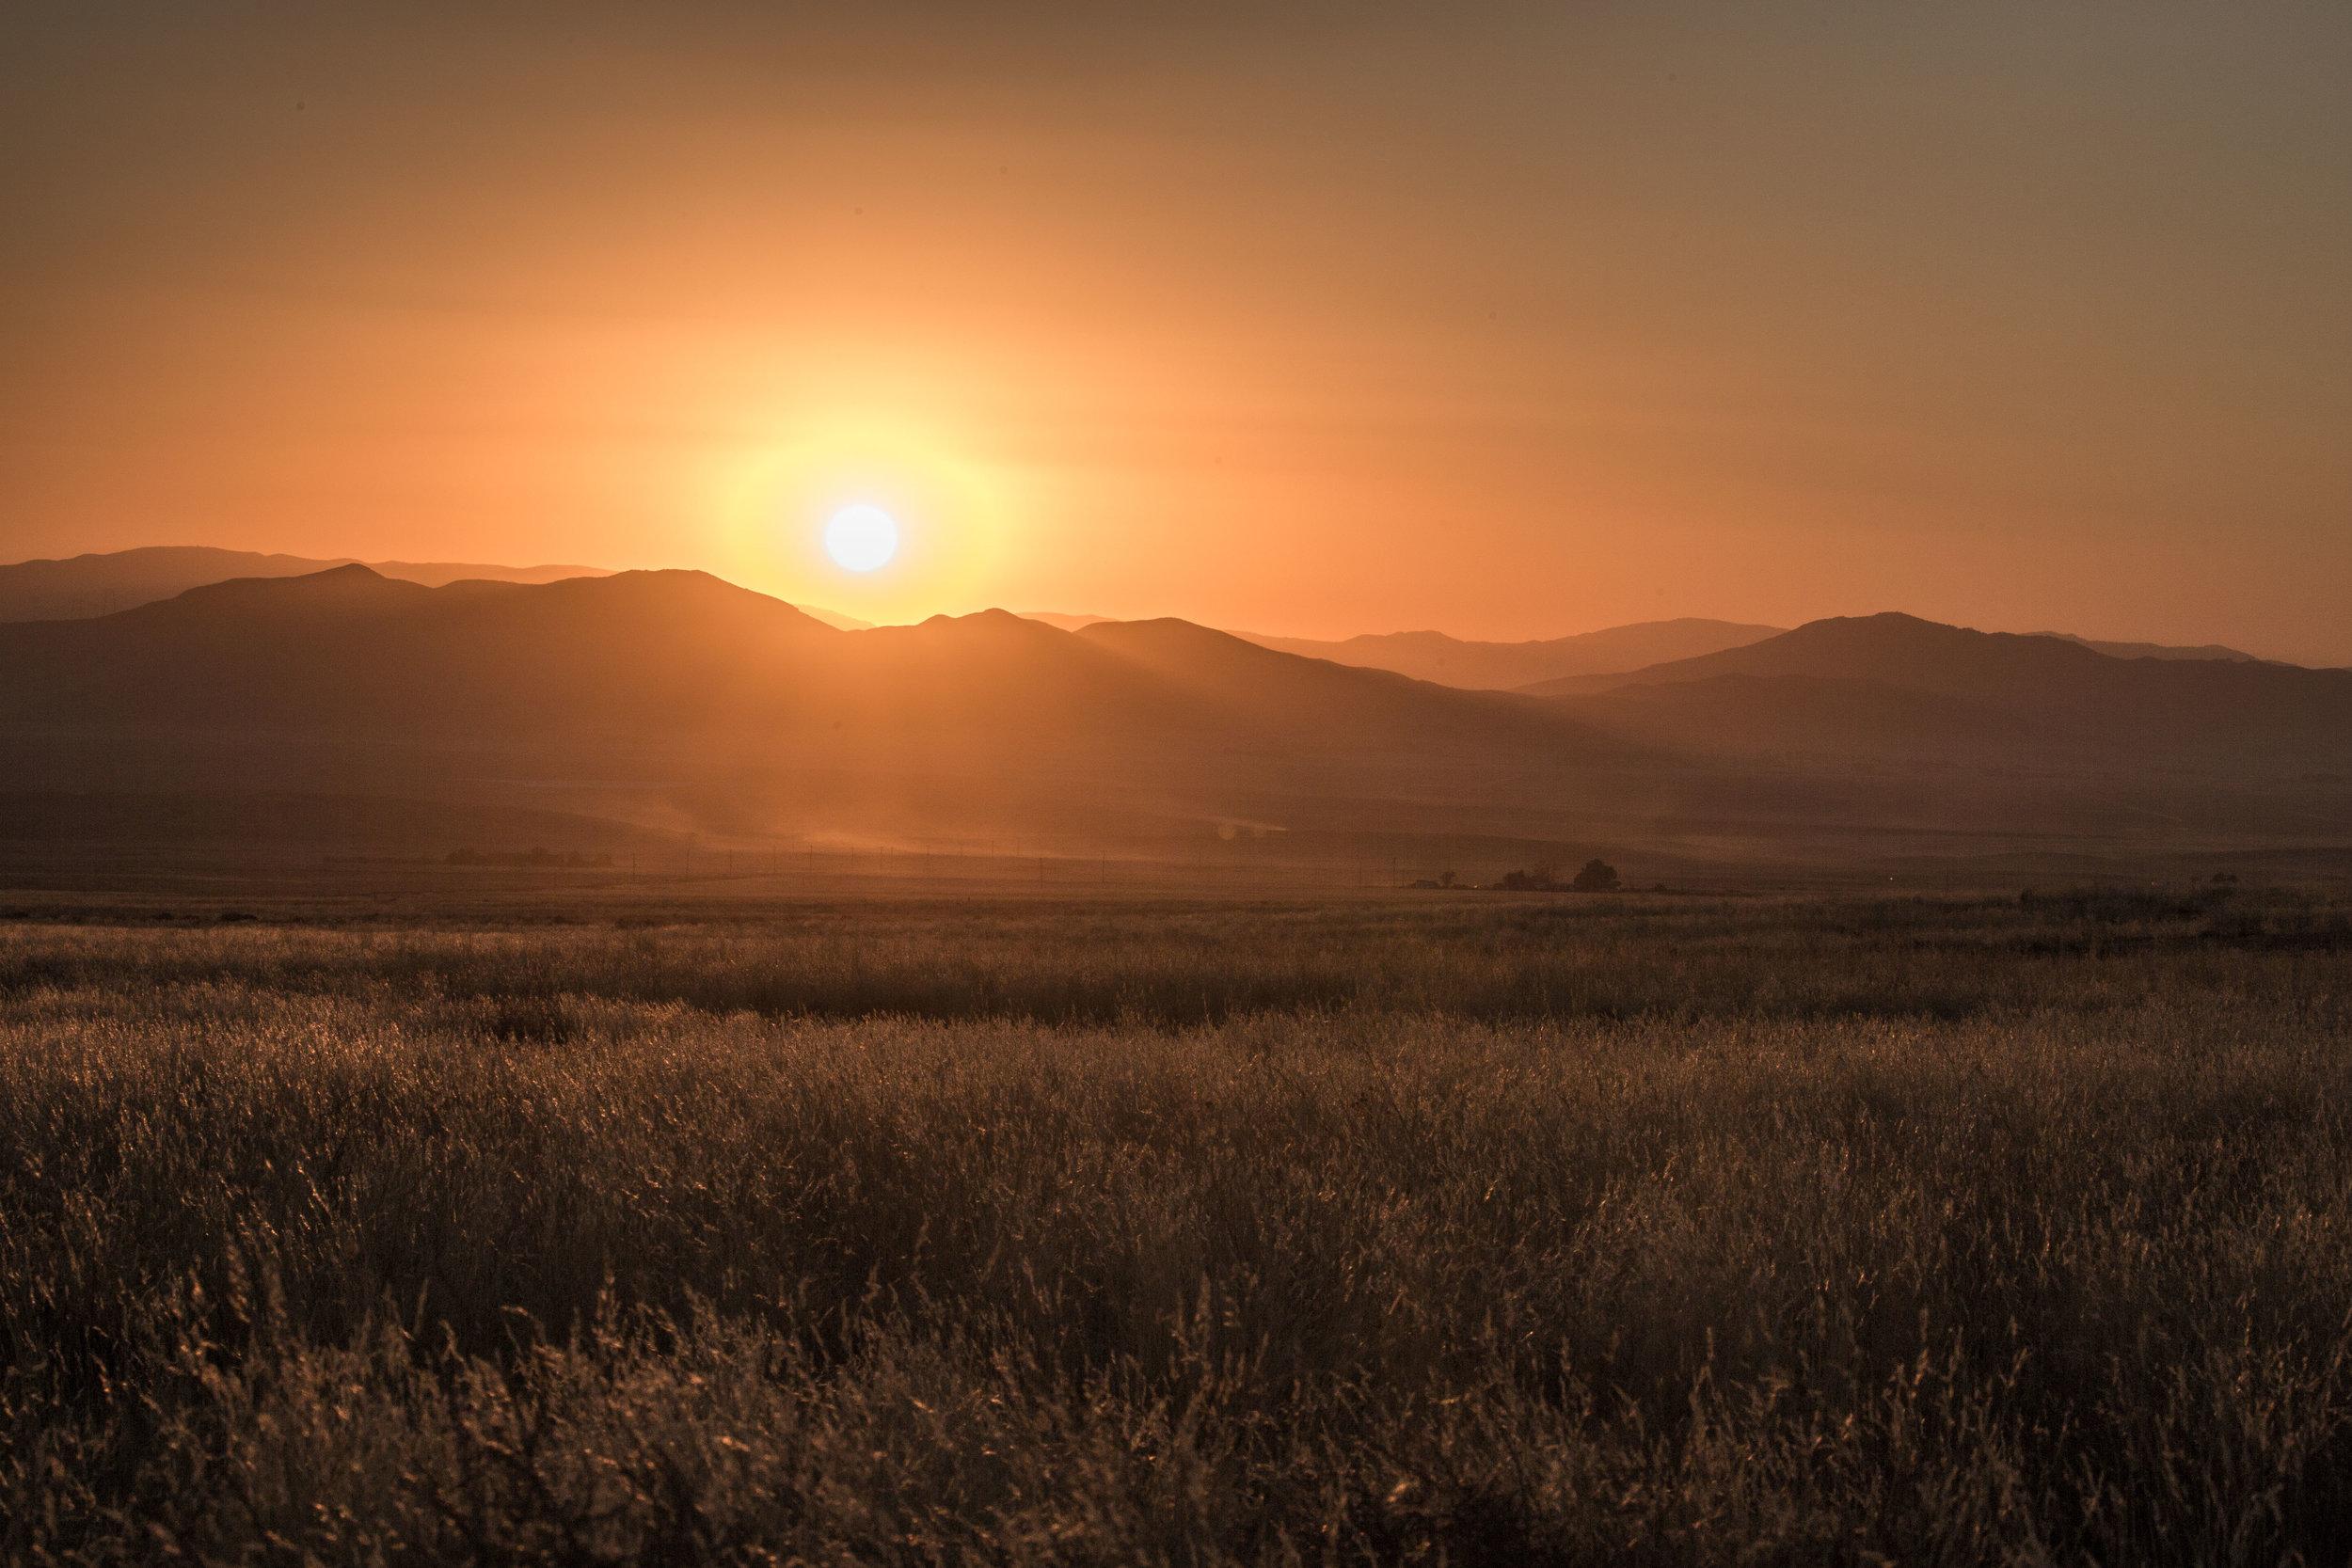 - The sun setting over the Caliente Range and Carrizo Plain's grasslands.